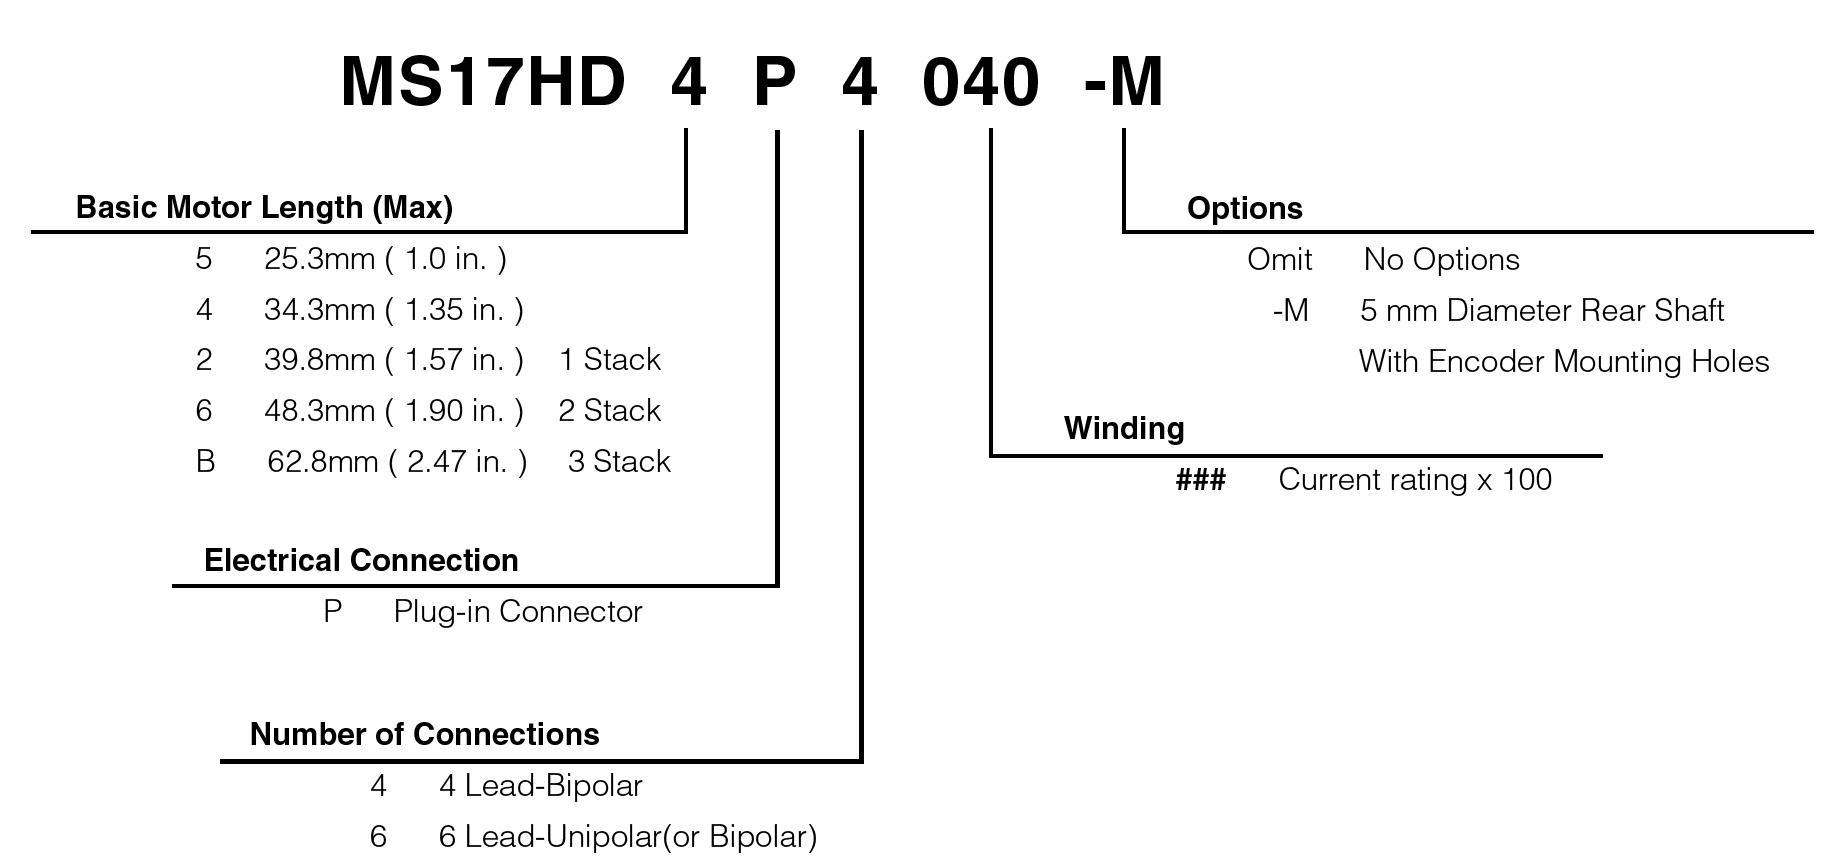 Moons Stepper Motor Wiring Diagram Nema 23 17 Standard Hybrid Motors 42x42mm Faceplate 2